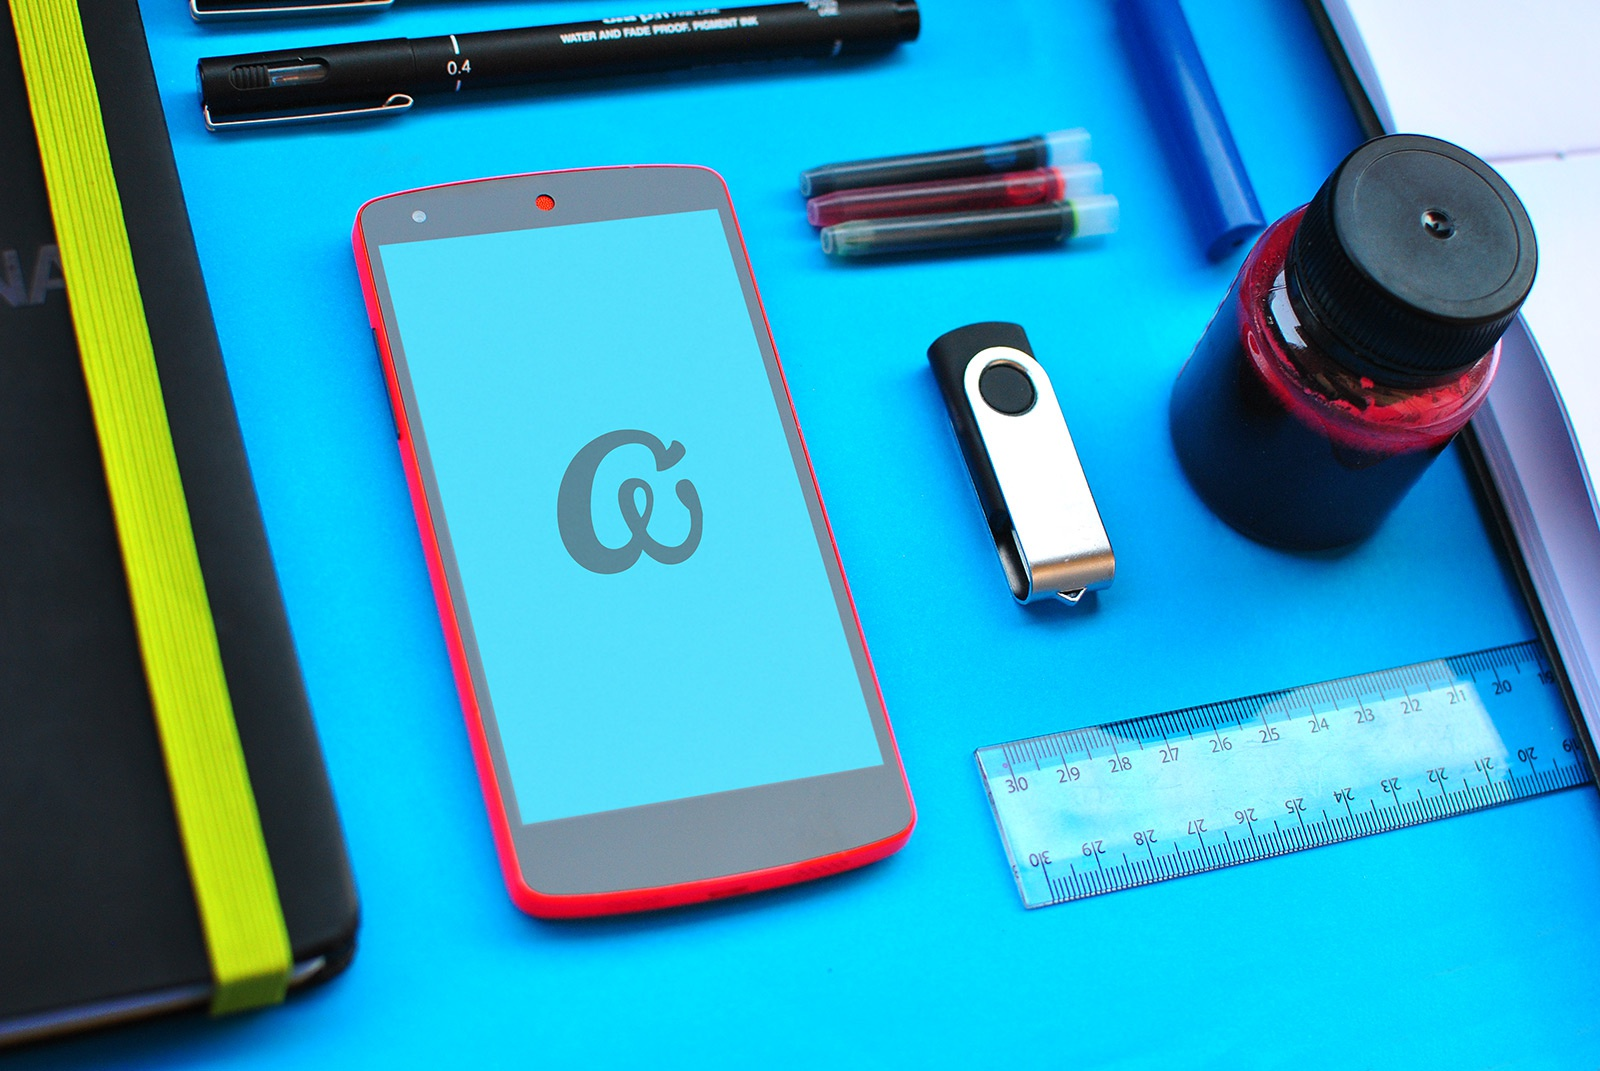 Nexus 5 blue